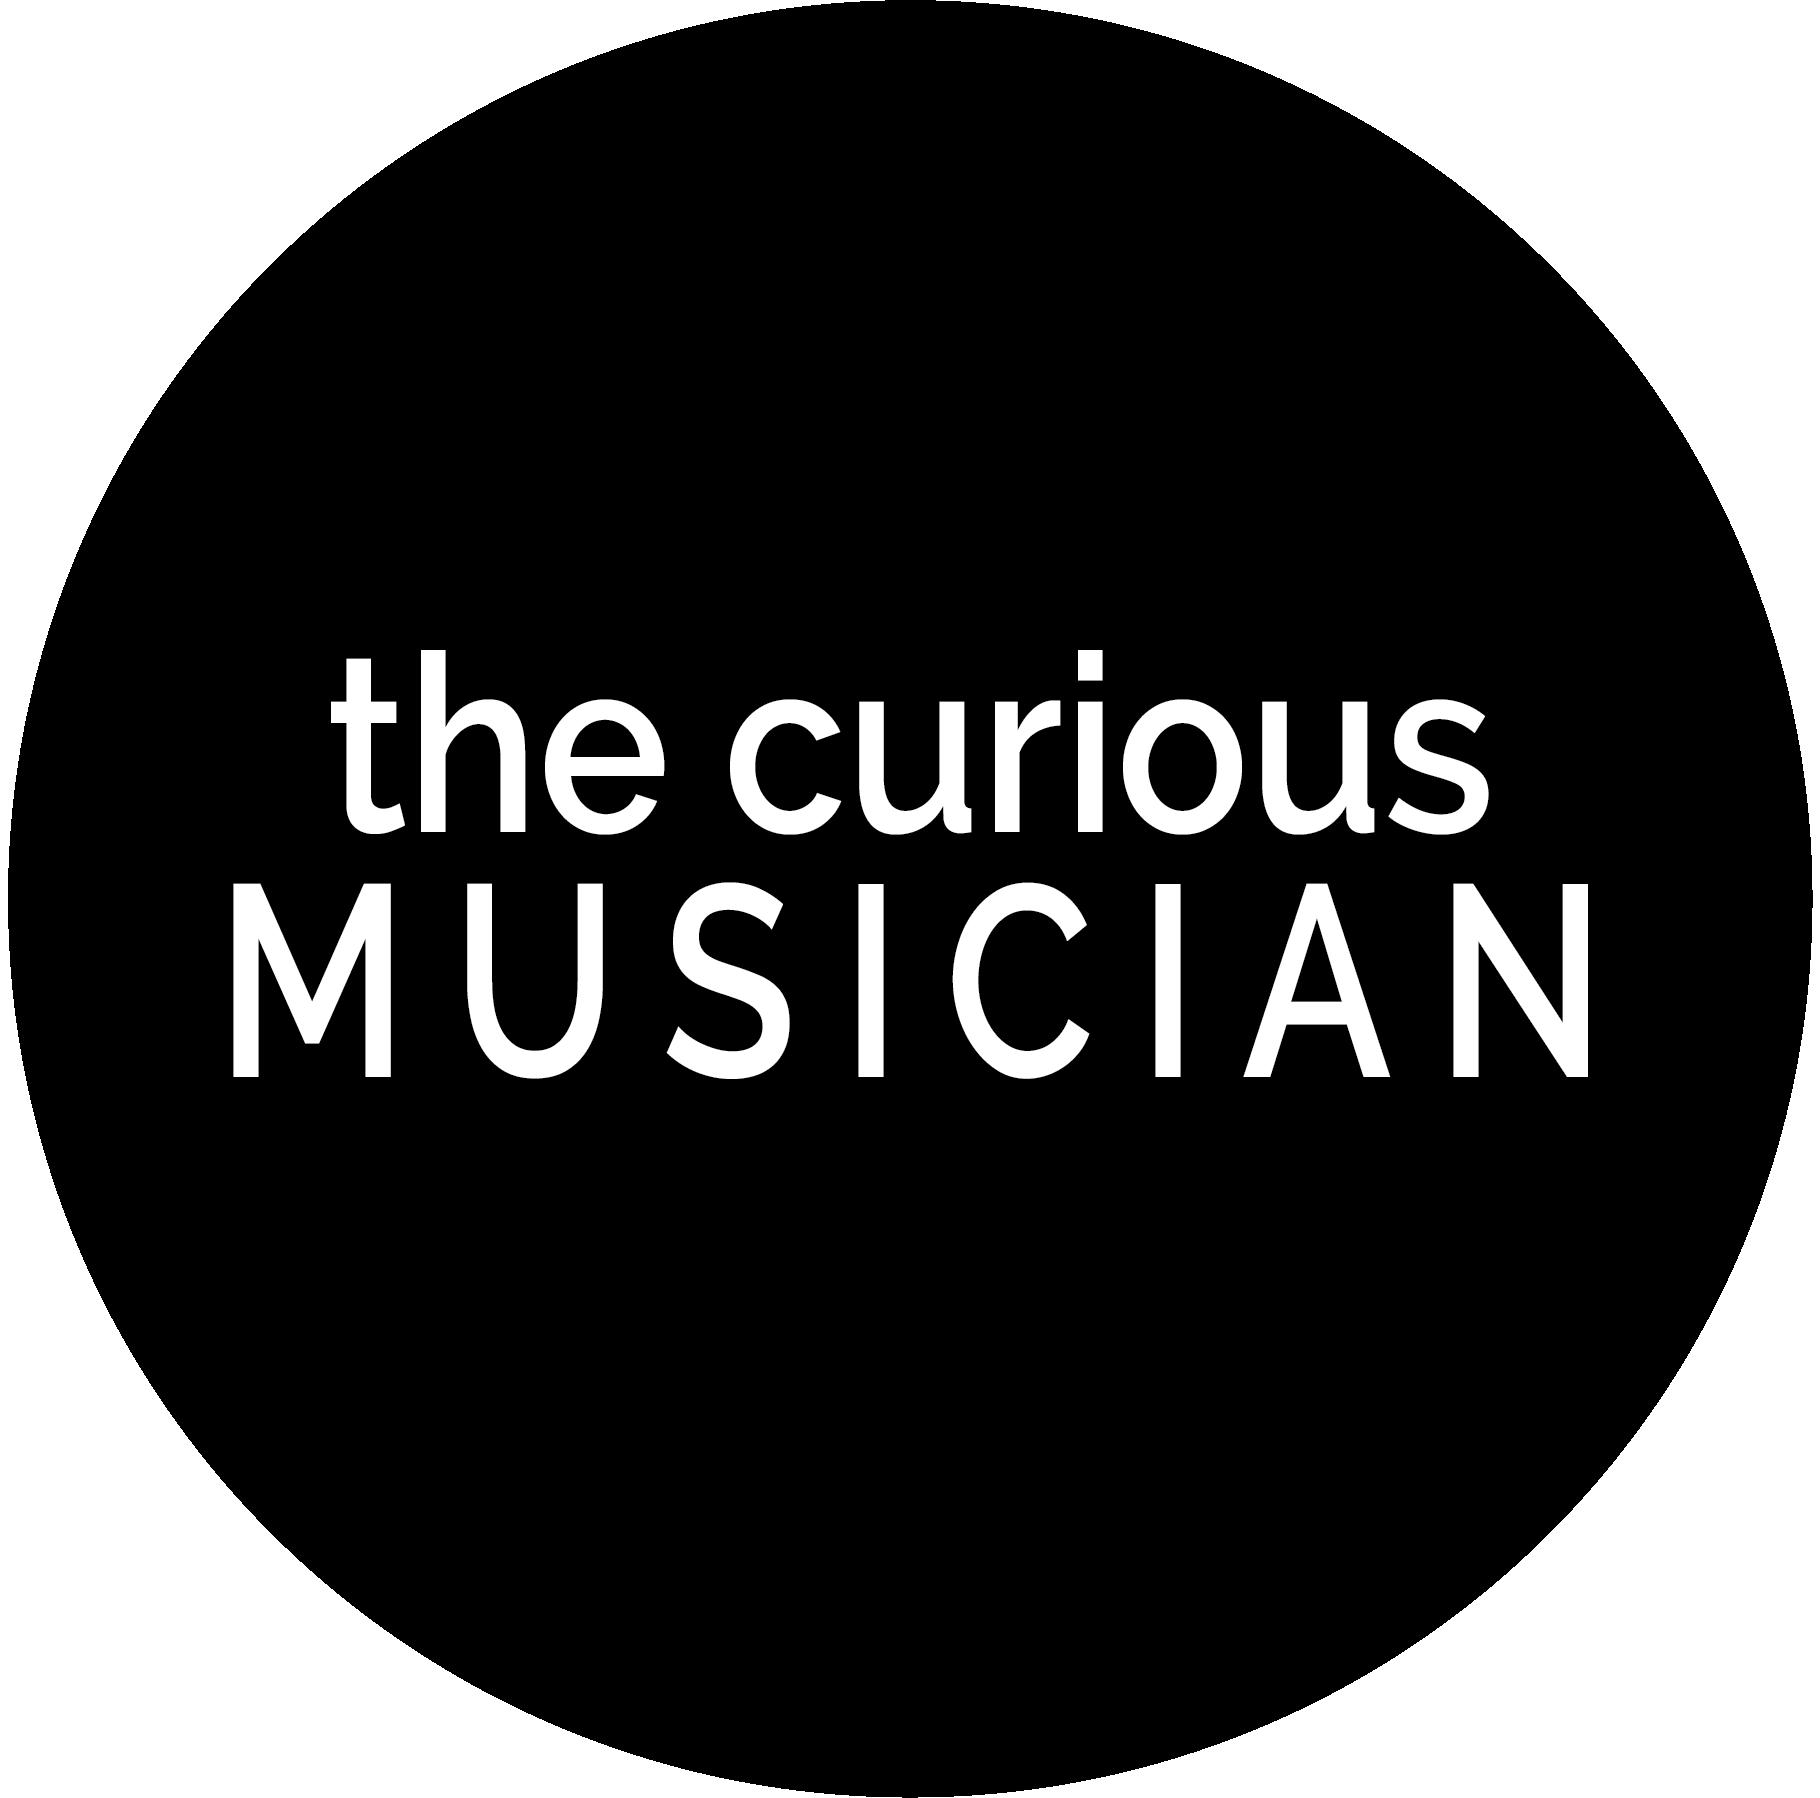 The Curious Musician - FacebookInstagram